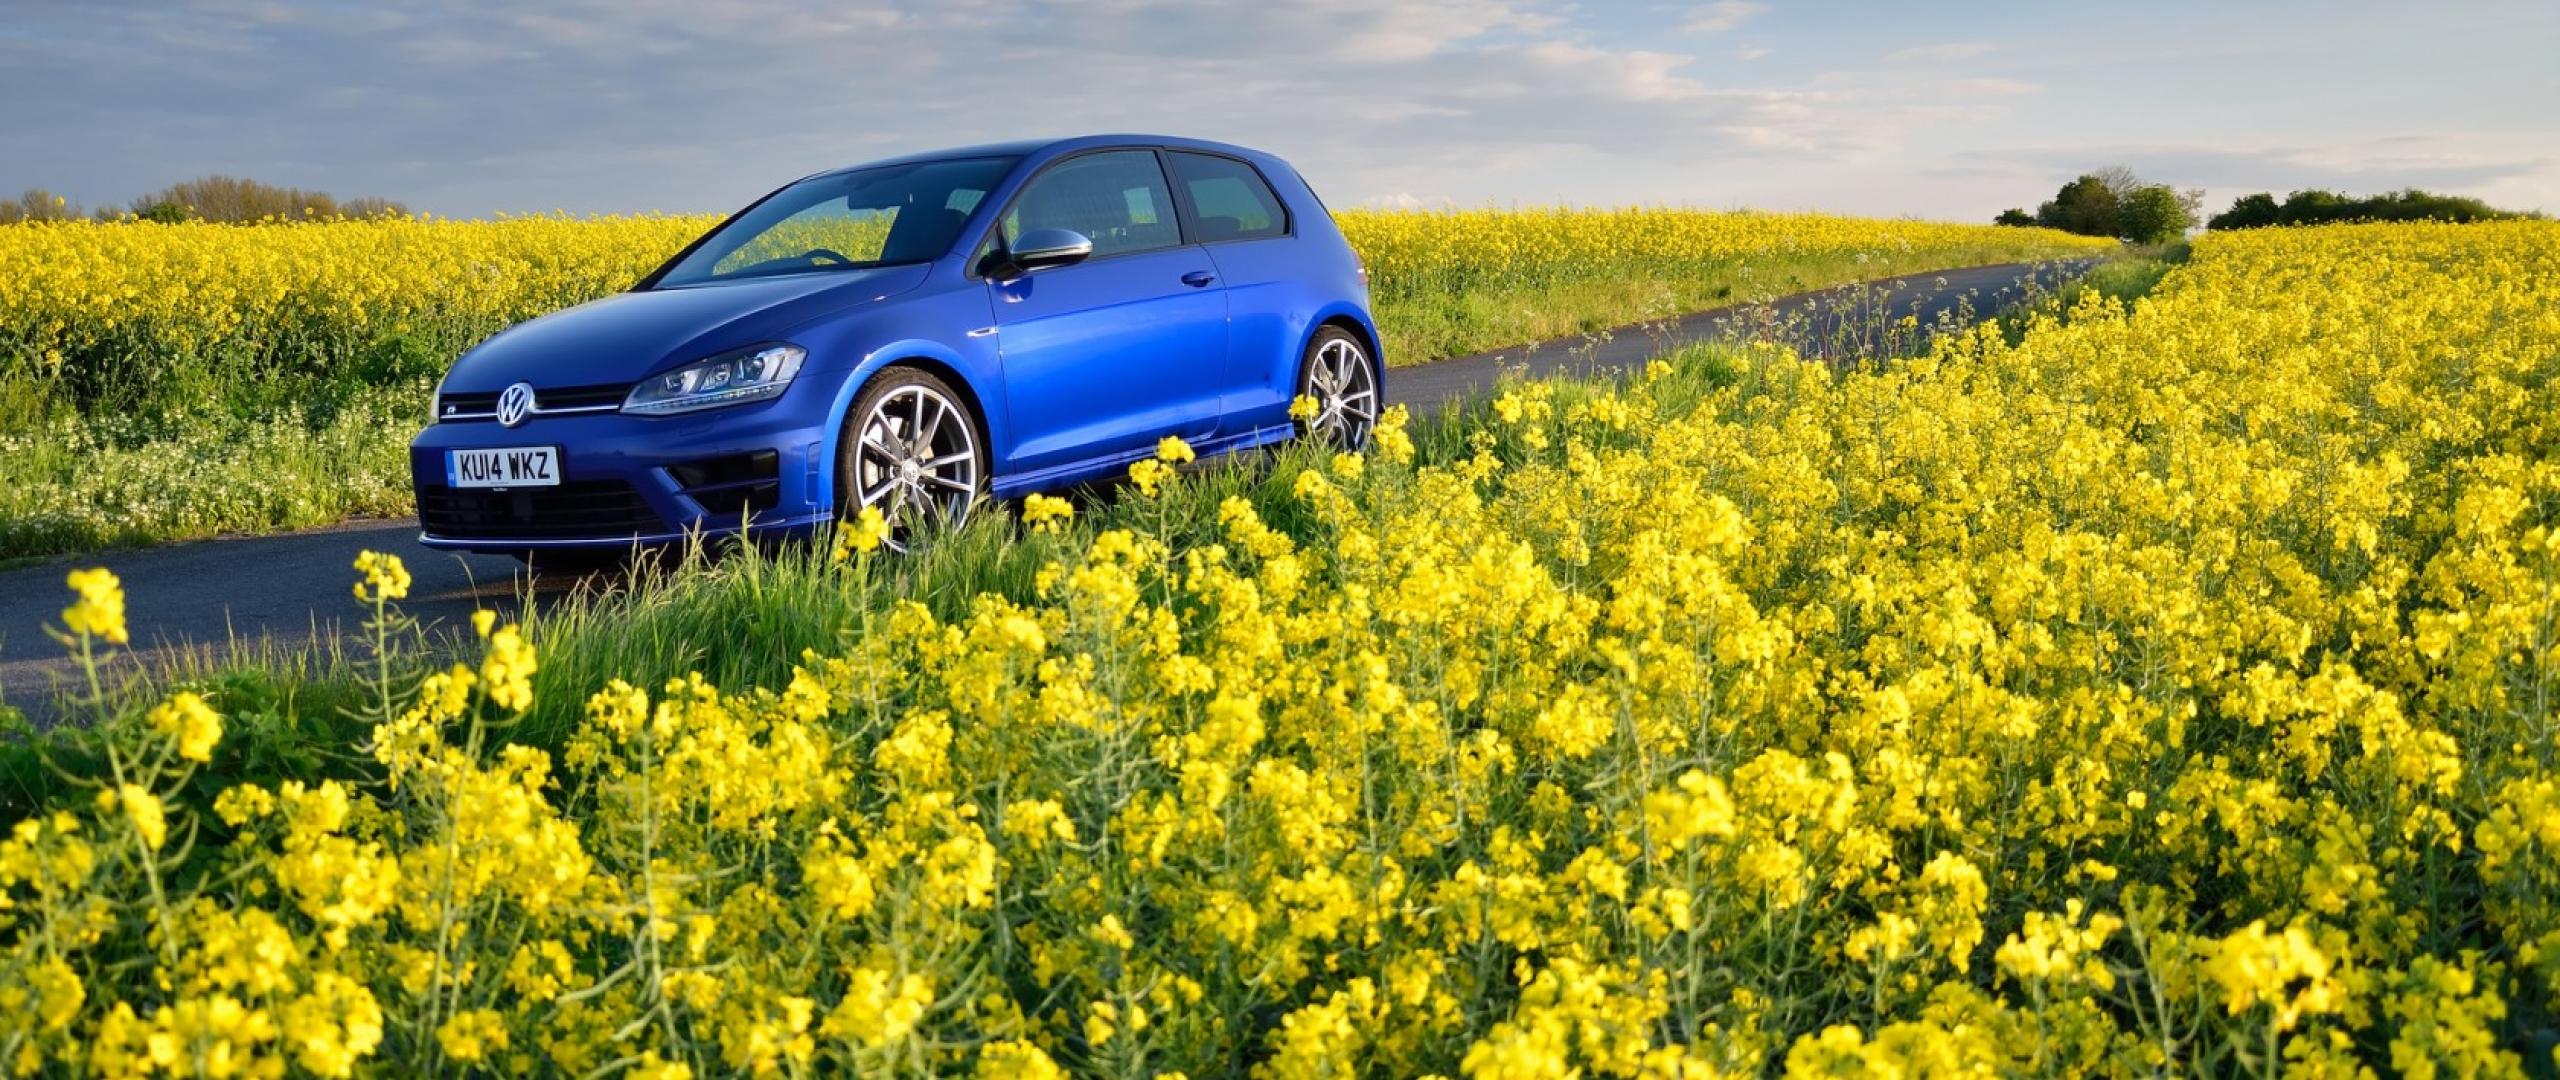 2560x1080 Volkswagen Golf R Mk7 2560x1080 Resolution Wallpaper Hd